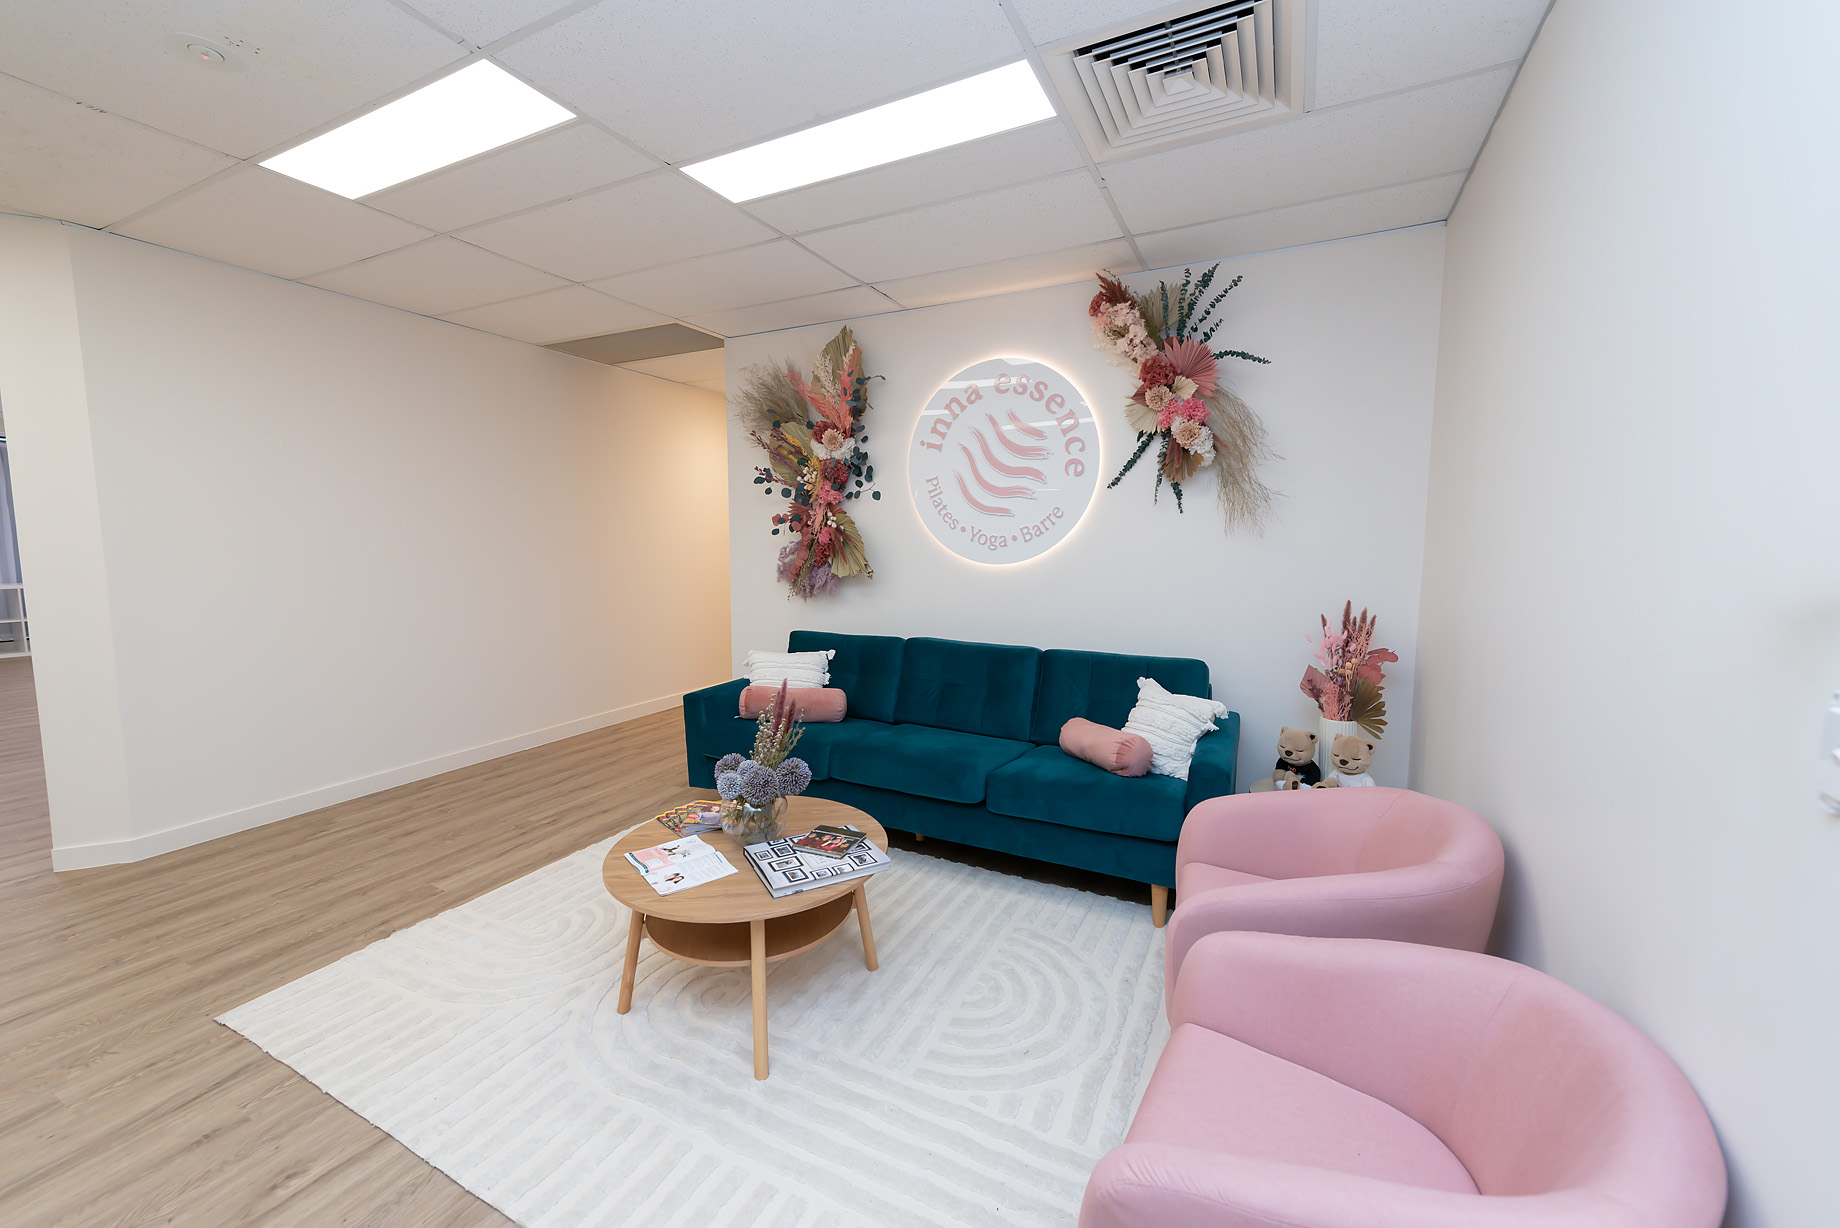 New Inna Essence studio reception